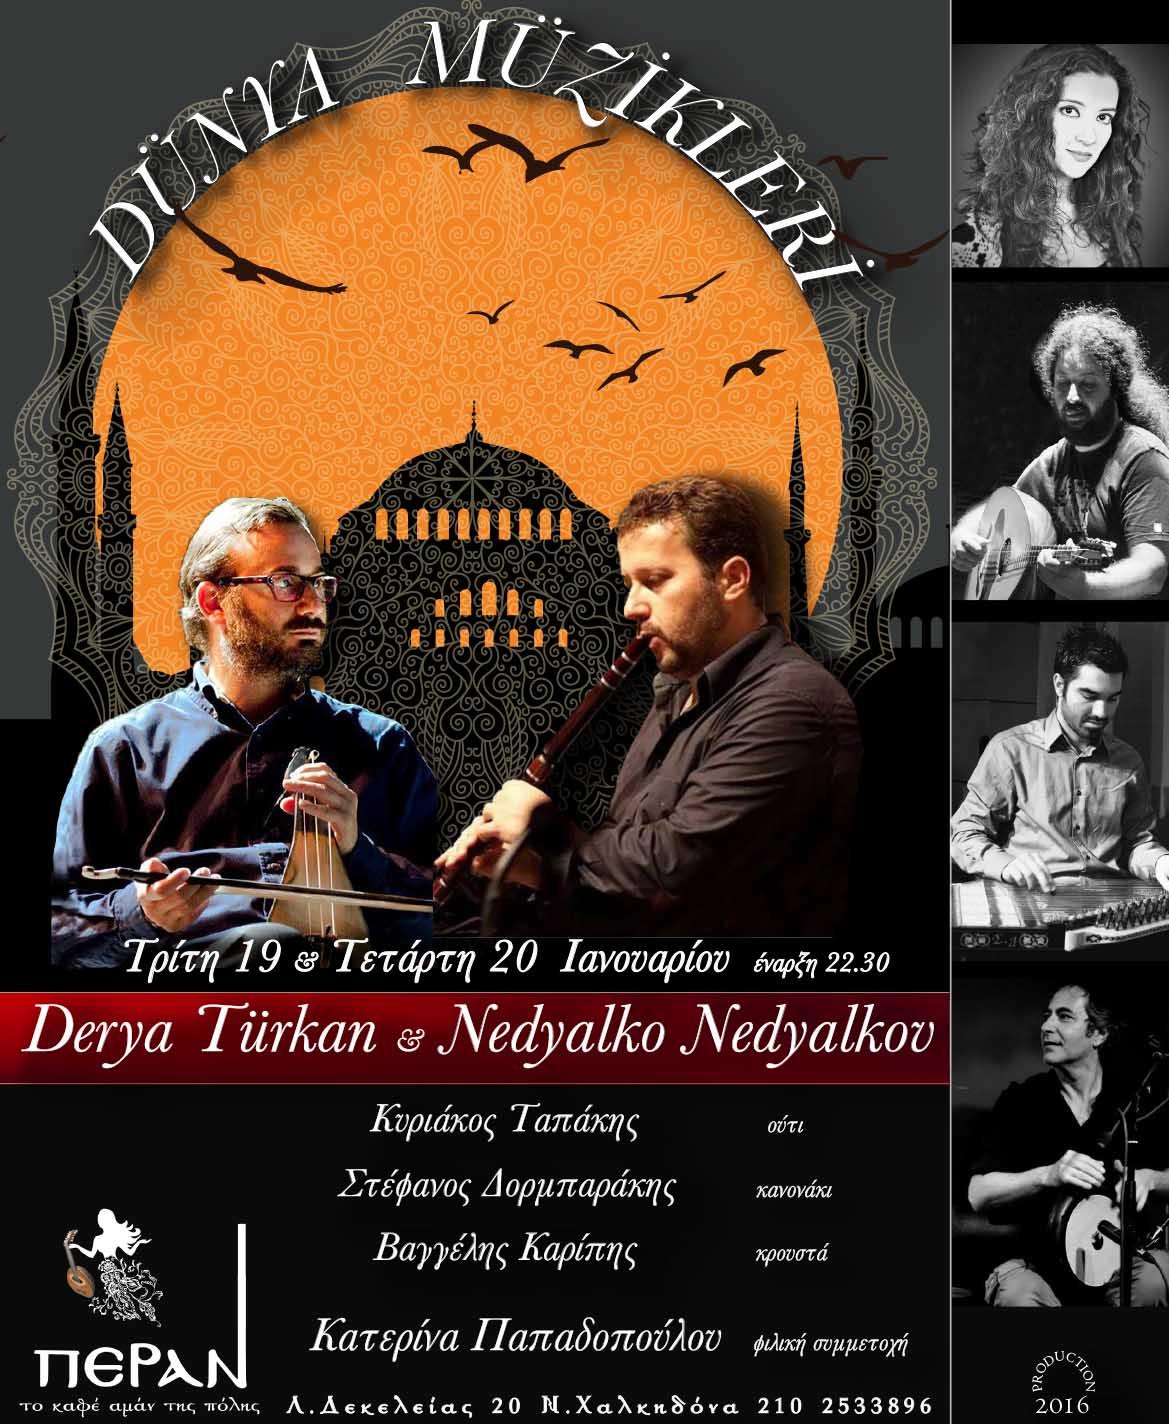 DunyaMuzilkeri